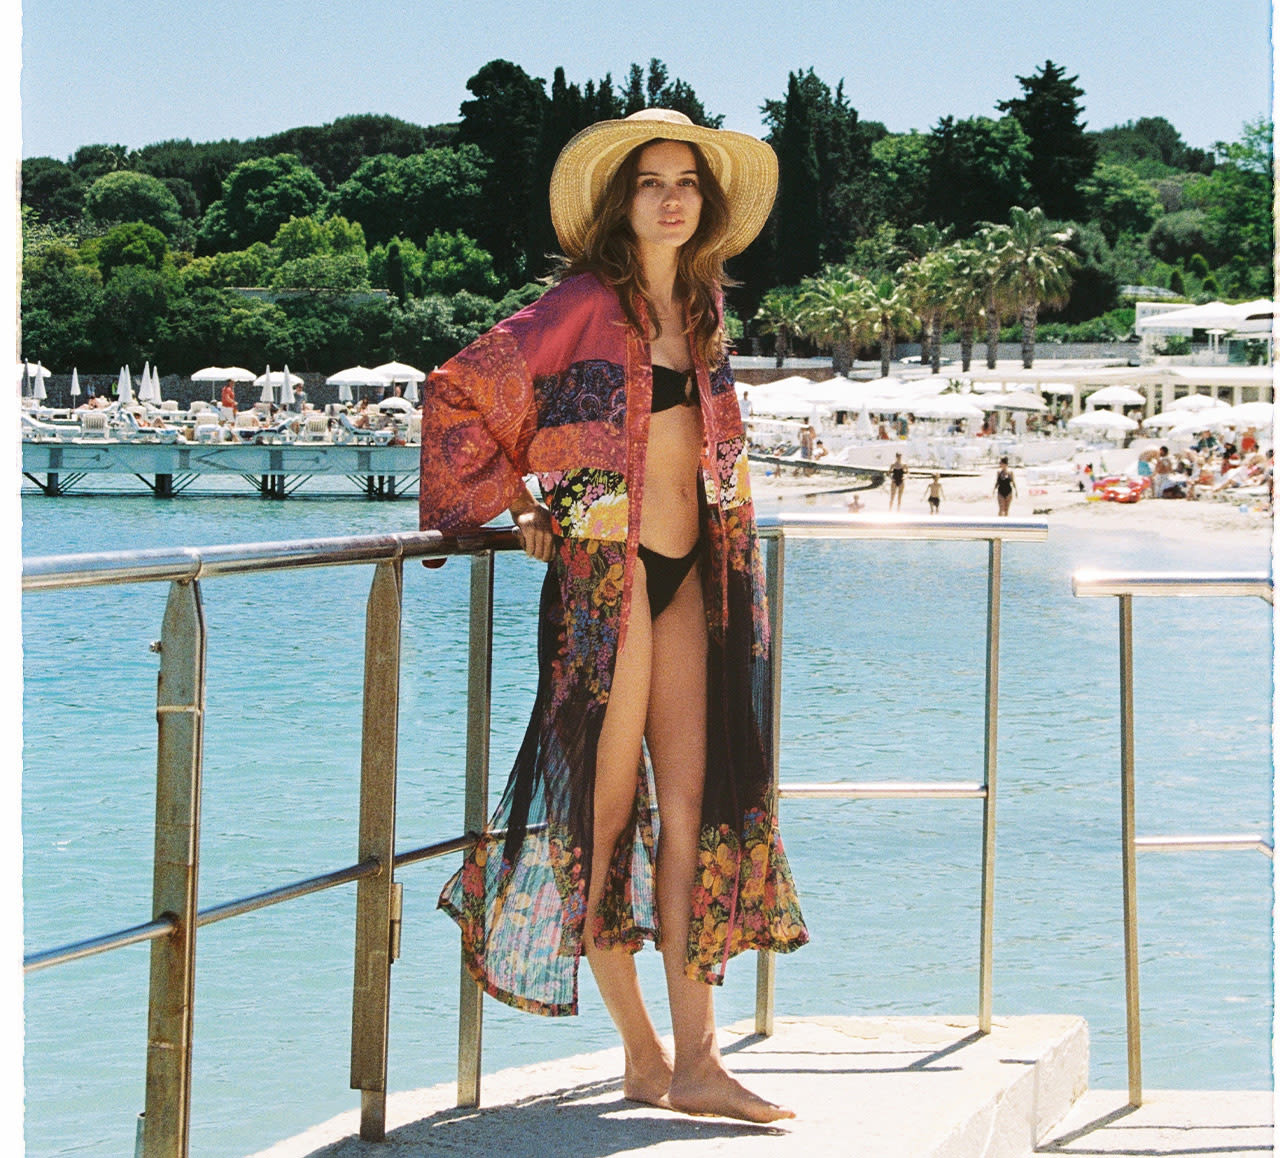 f54301e3de59b Bohemian Clothing | Boho & Hippie Clothes for Women | Free People